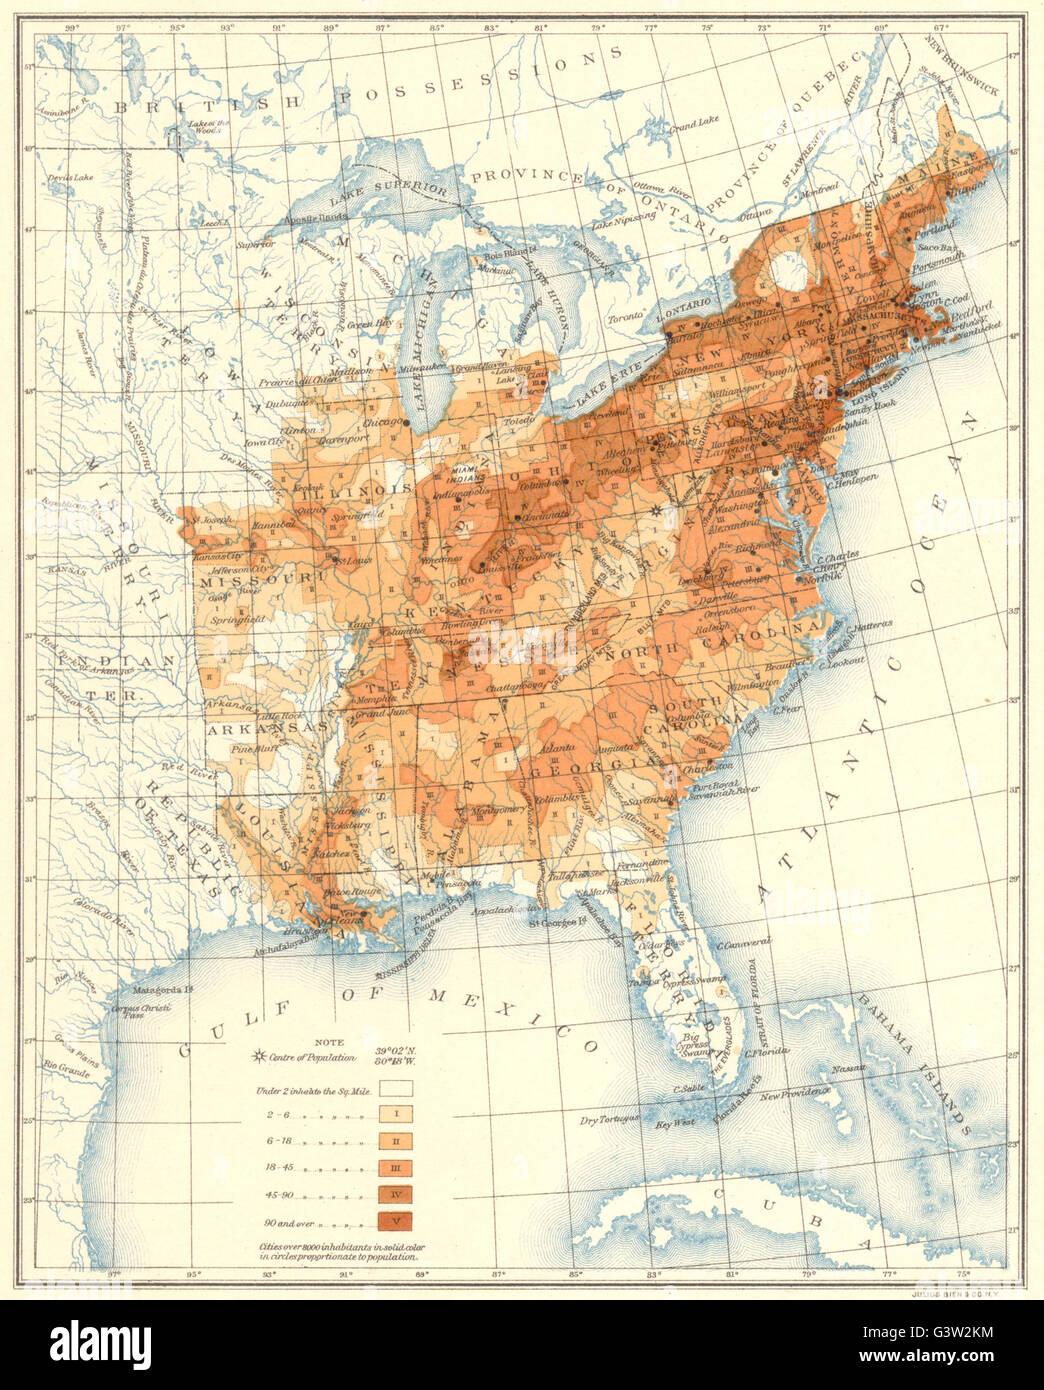 Population Map Usa Stock Photos Population Map Usa Stock Images